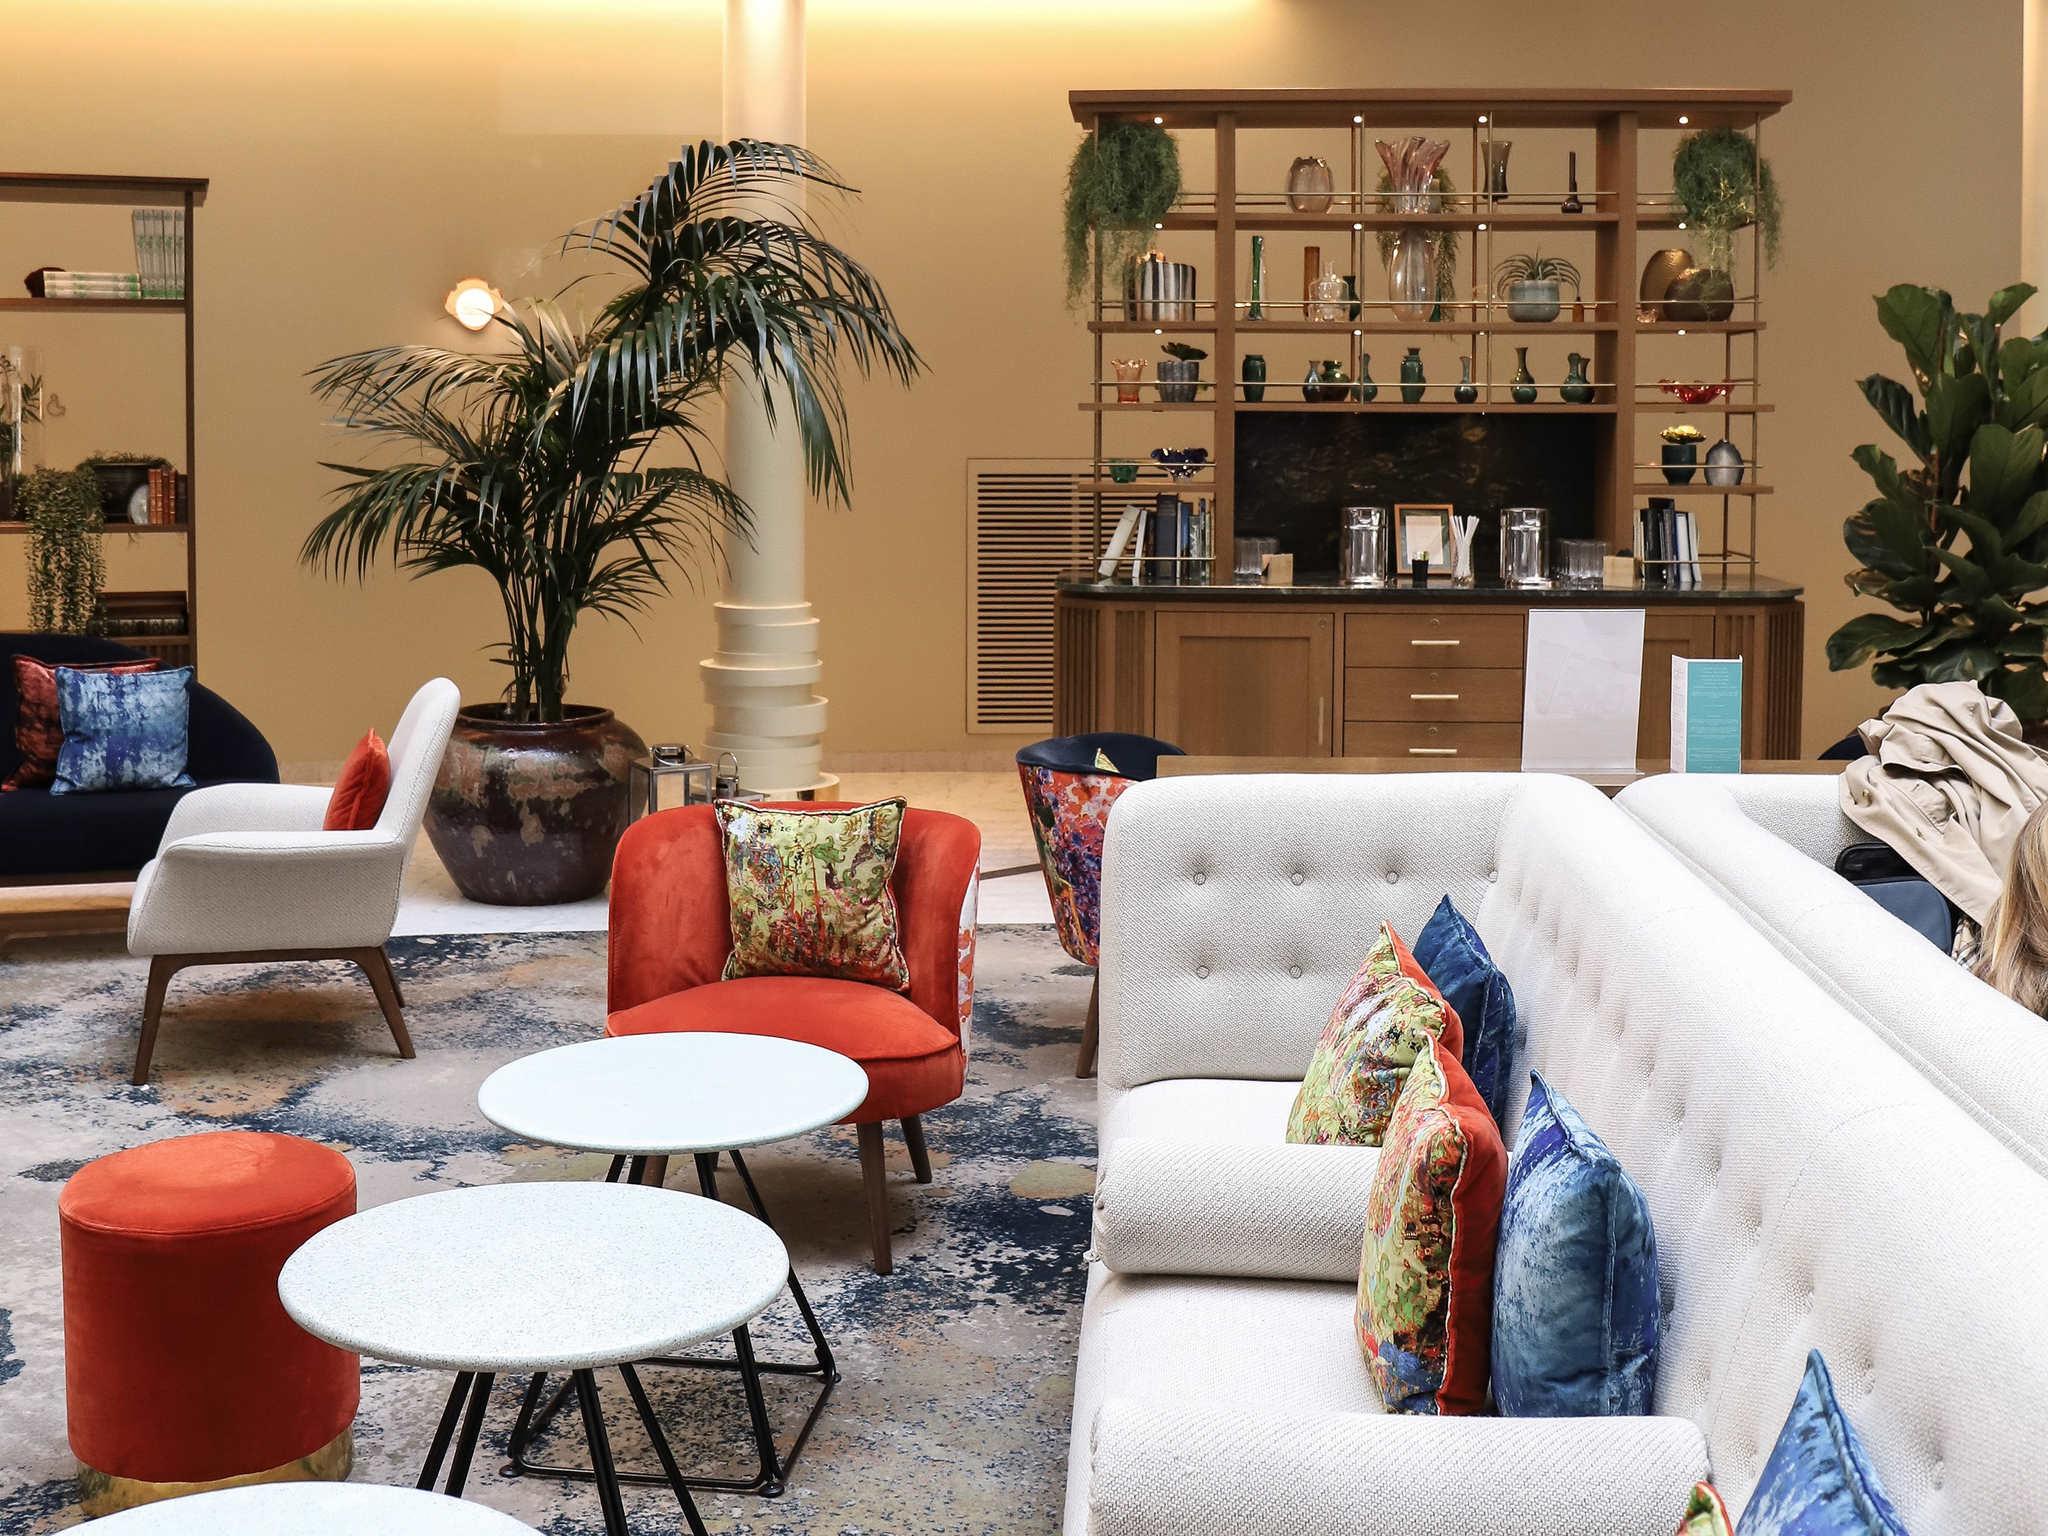 Hotel - Sofitel Brussels Europe